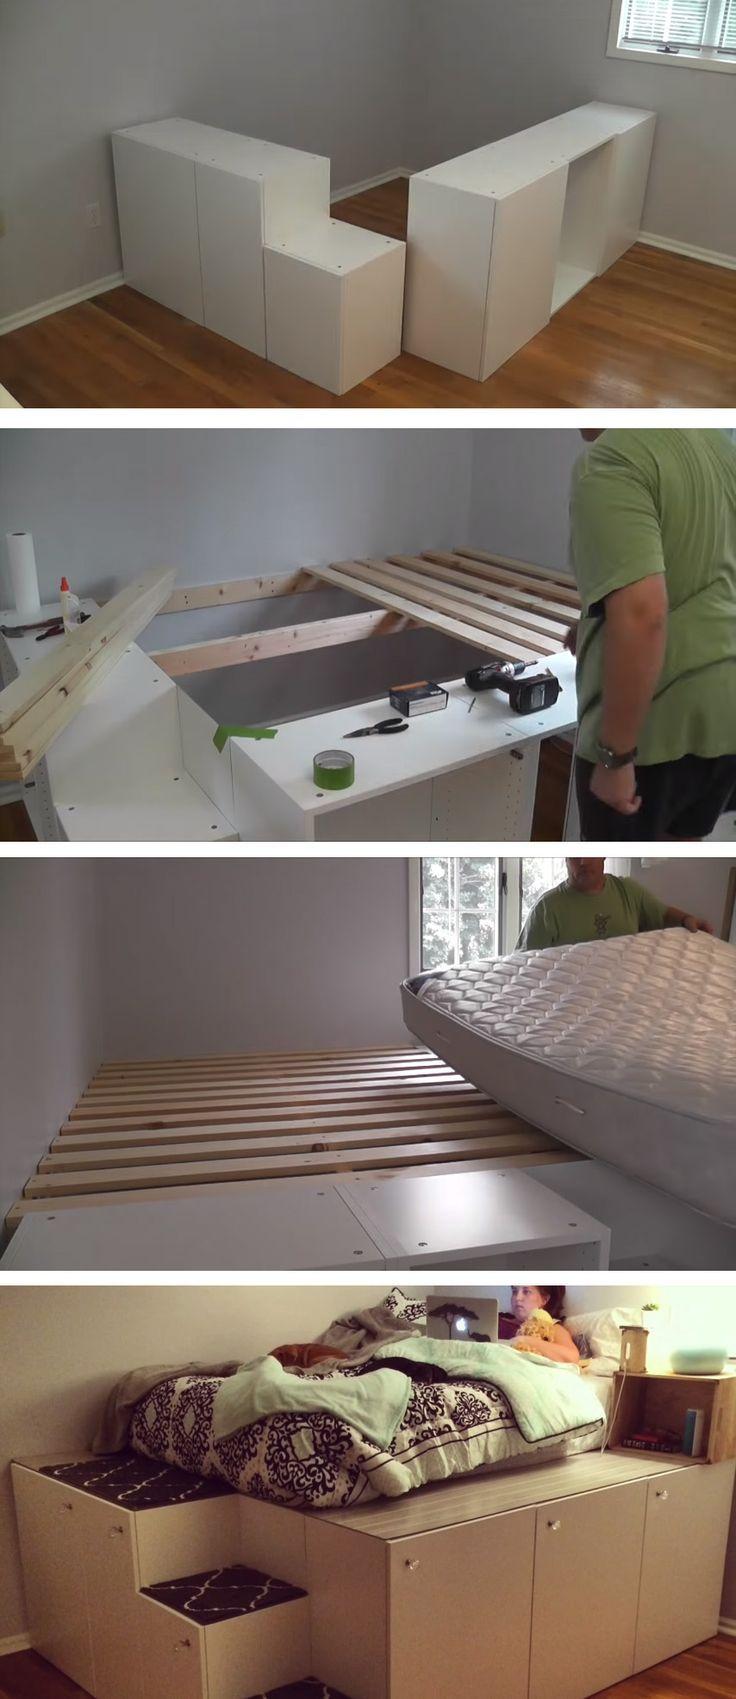 17 Wonderful Diy Platform Beds | Platform beds, Ikea kitchen ...